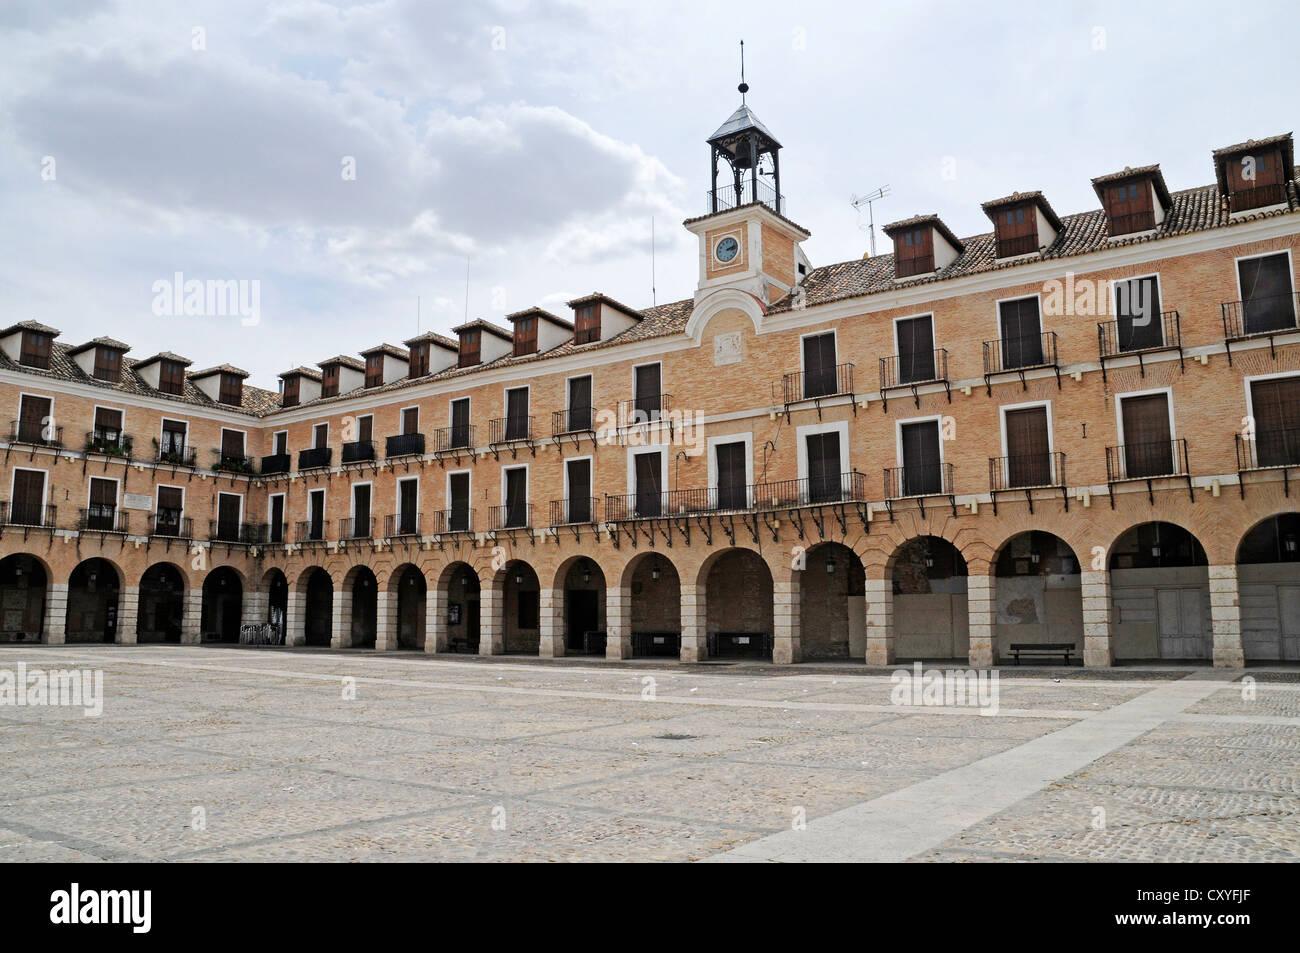 Arcades, Plaza Mayor square, Ocana, Castilla-La Mancha, Castile, Spain, Europe, PublicGround - Stock Image